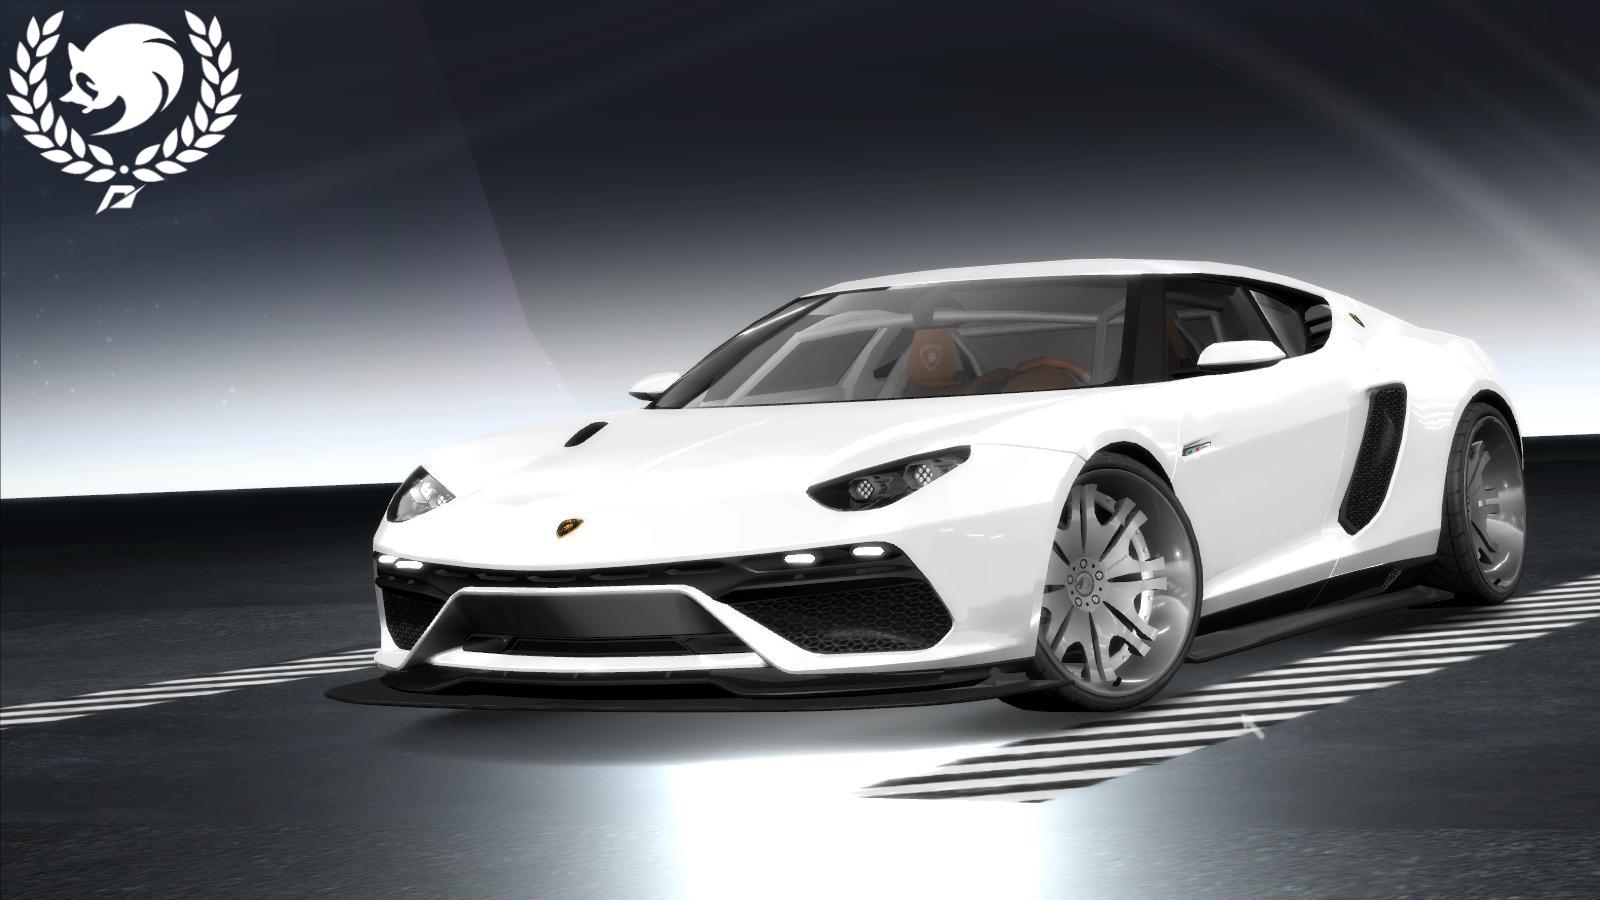 Nfsmods Lamborghini Asterion